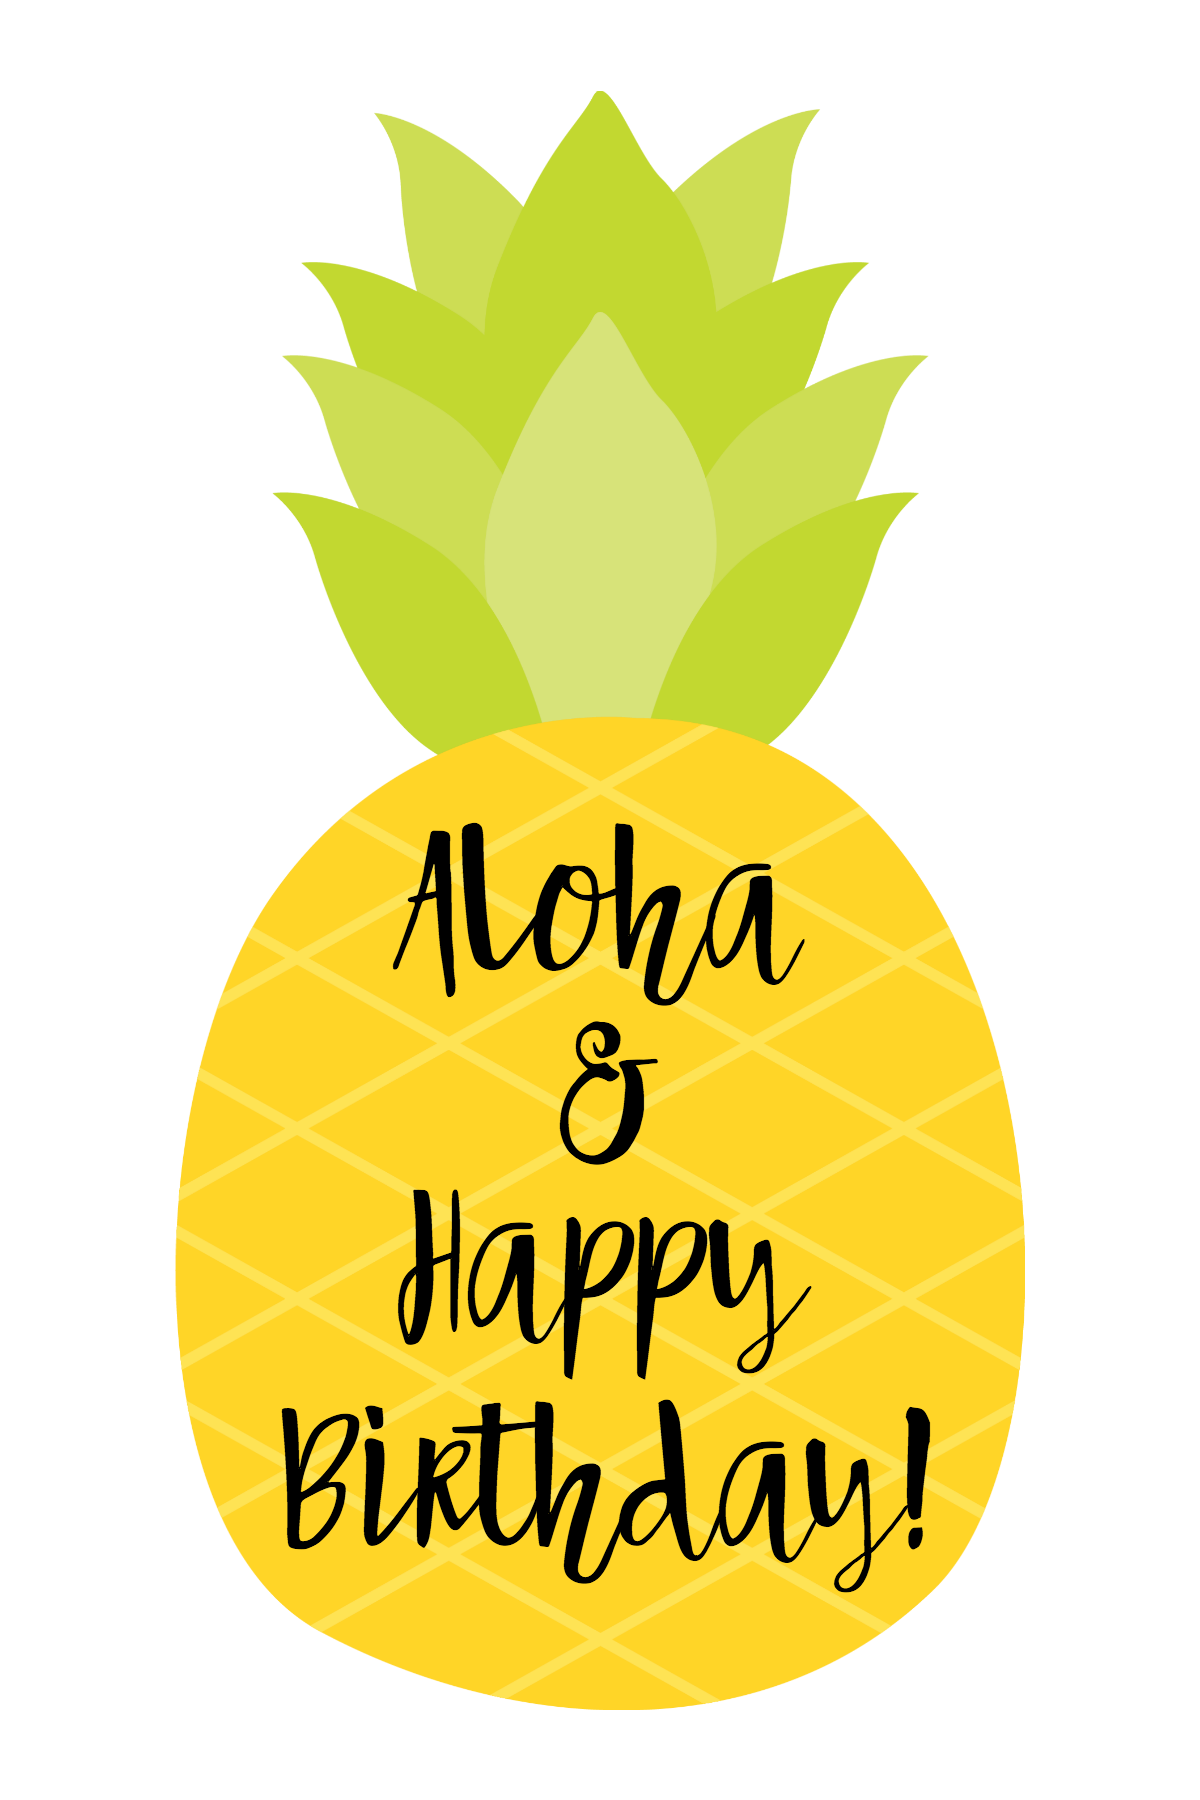 Cute Pineapple Themed Birthday Gift Idea